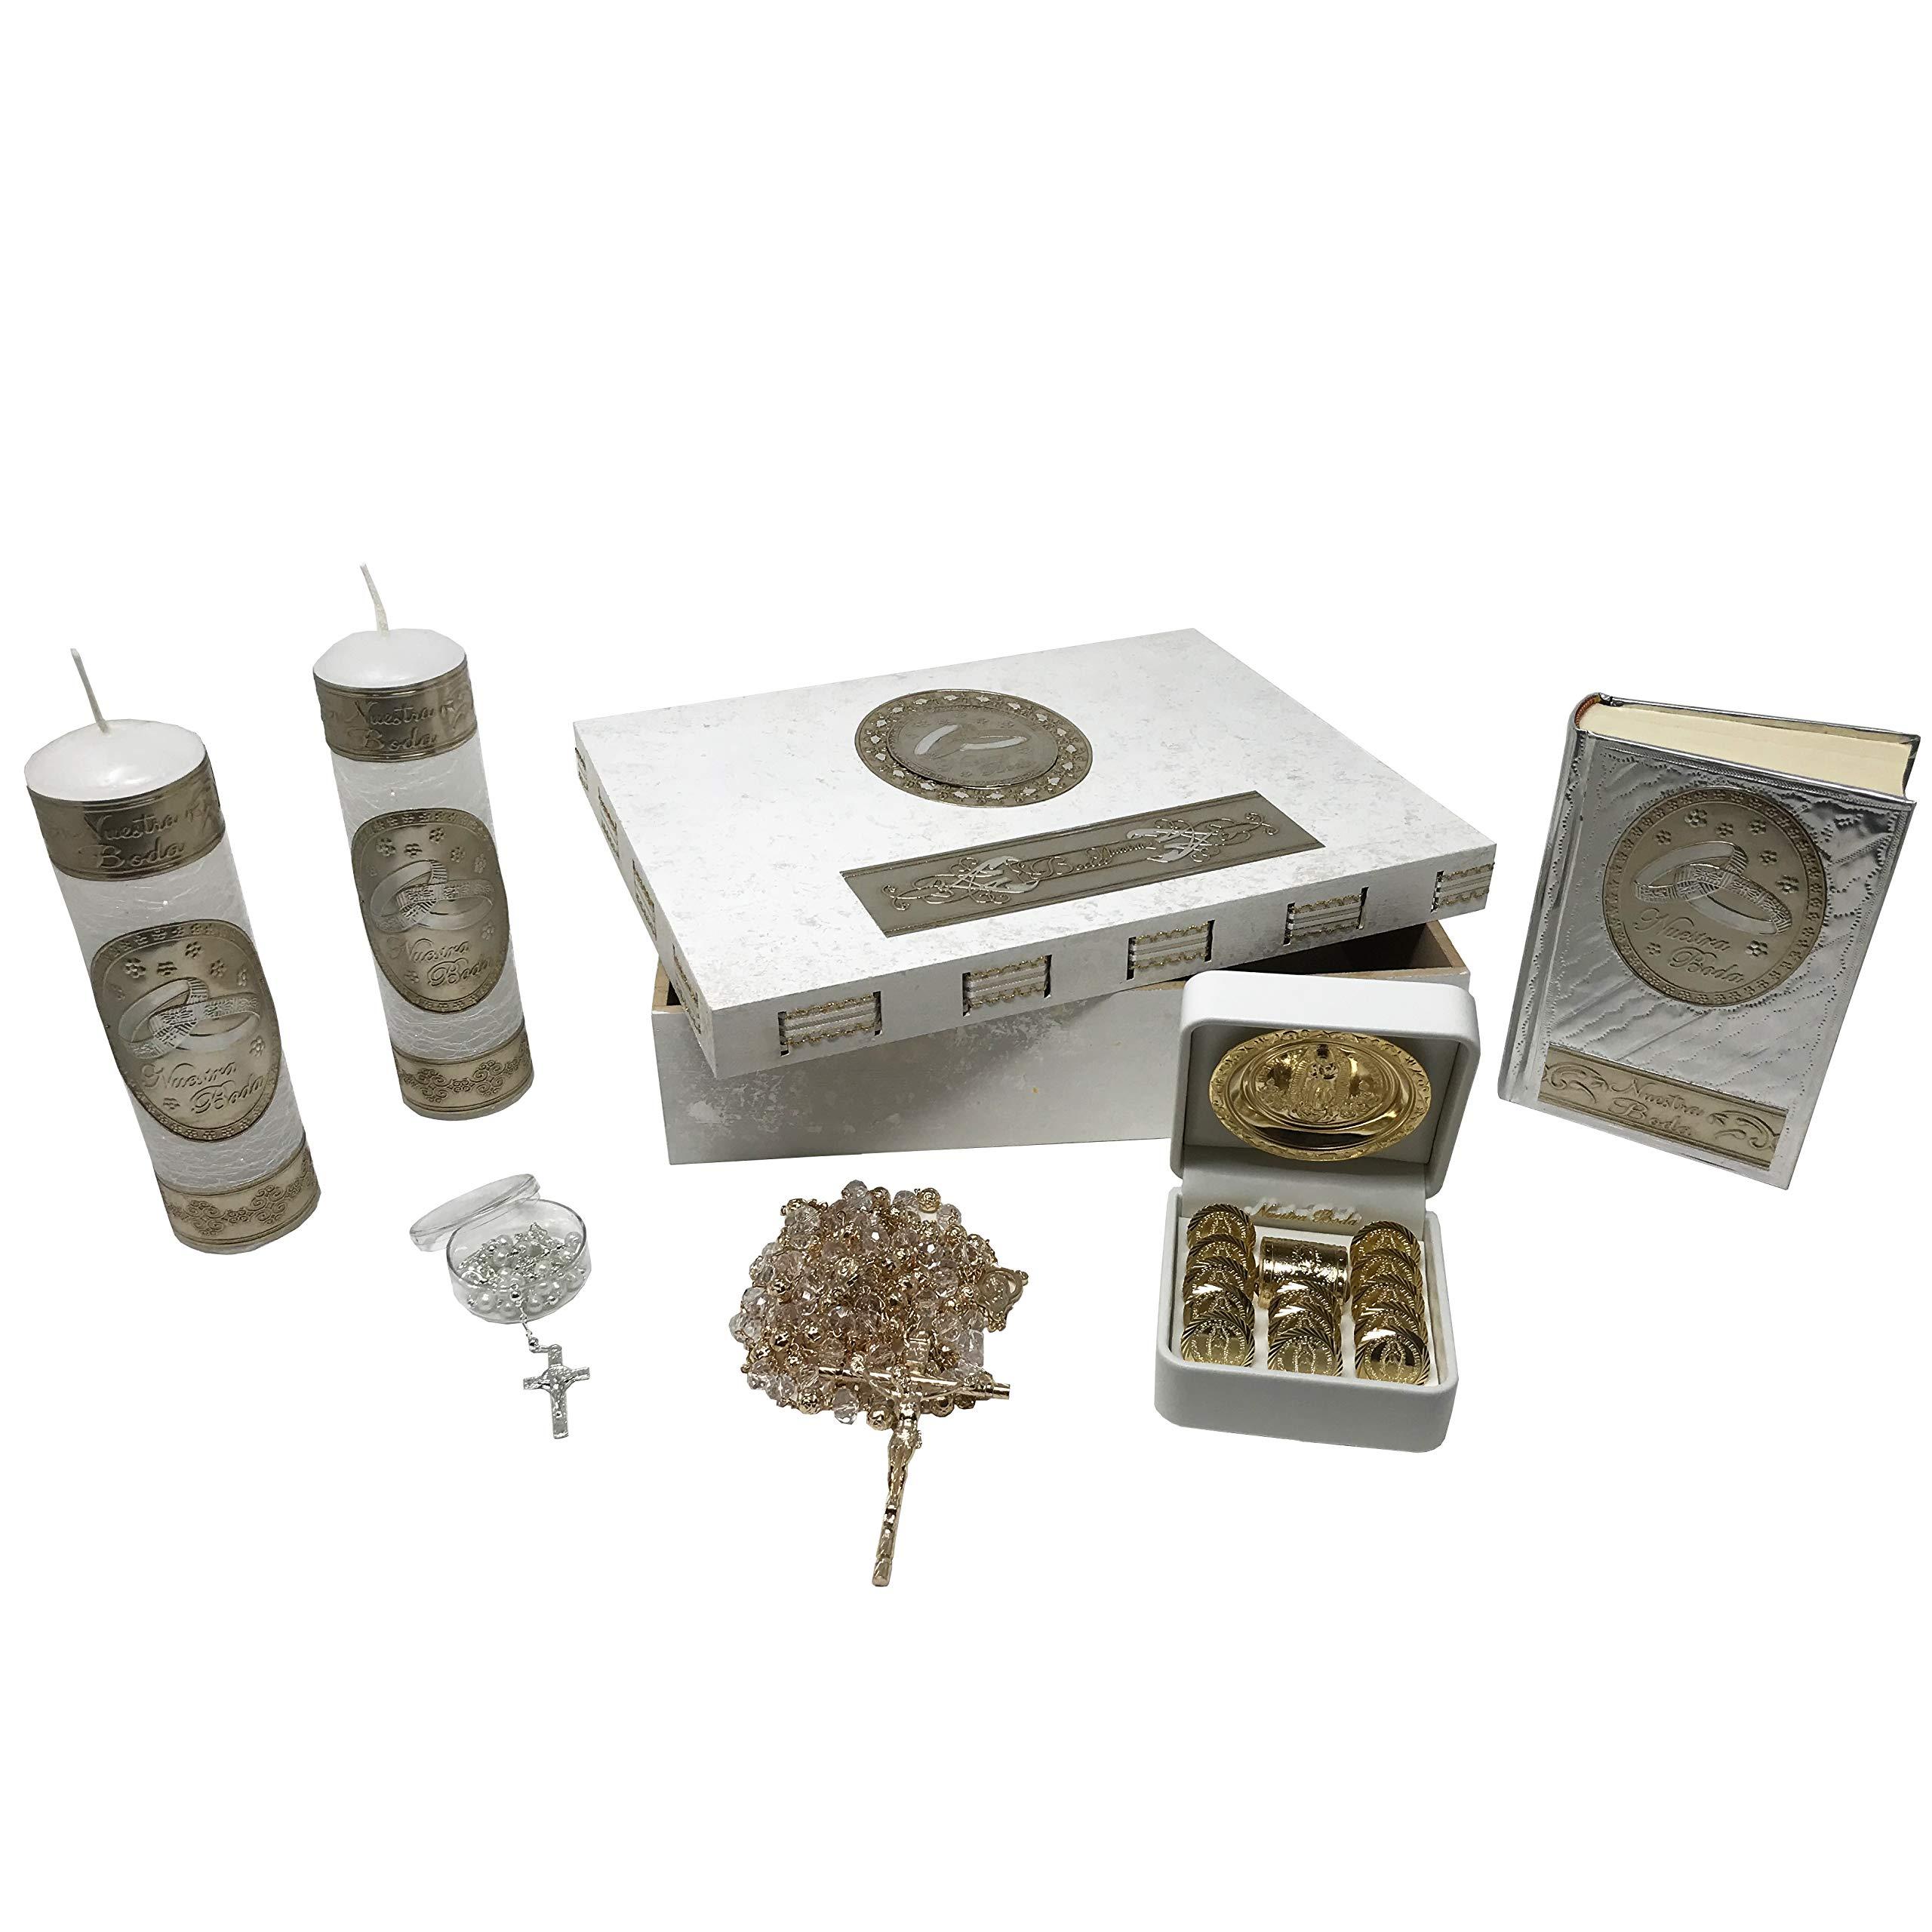 Catholic Wedding Kit in a Wooden Box with 2 Candles, Wedding Coins, Lasso Rope, Bible (Spanish) and Rosary. Kit de Boda Católico en Caja de Madera con 2 Velas, Arras, Lazo, Biblia (Español) y Rosario.